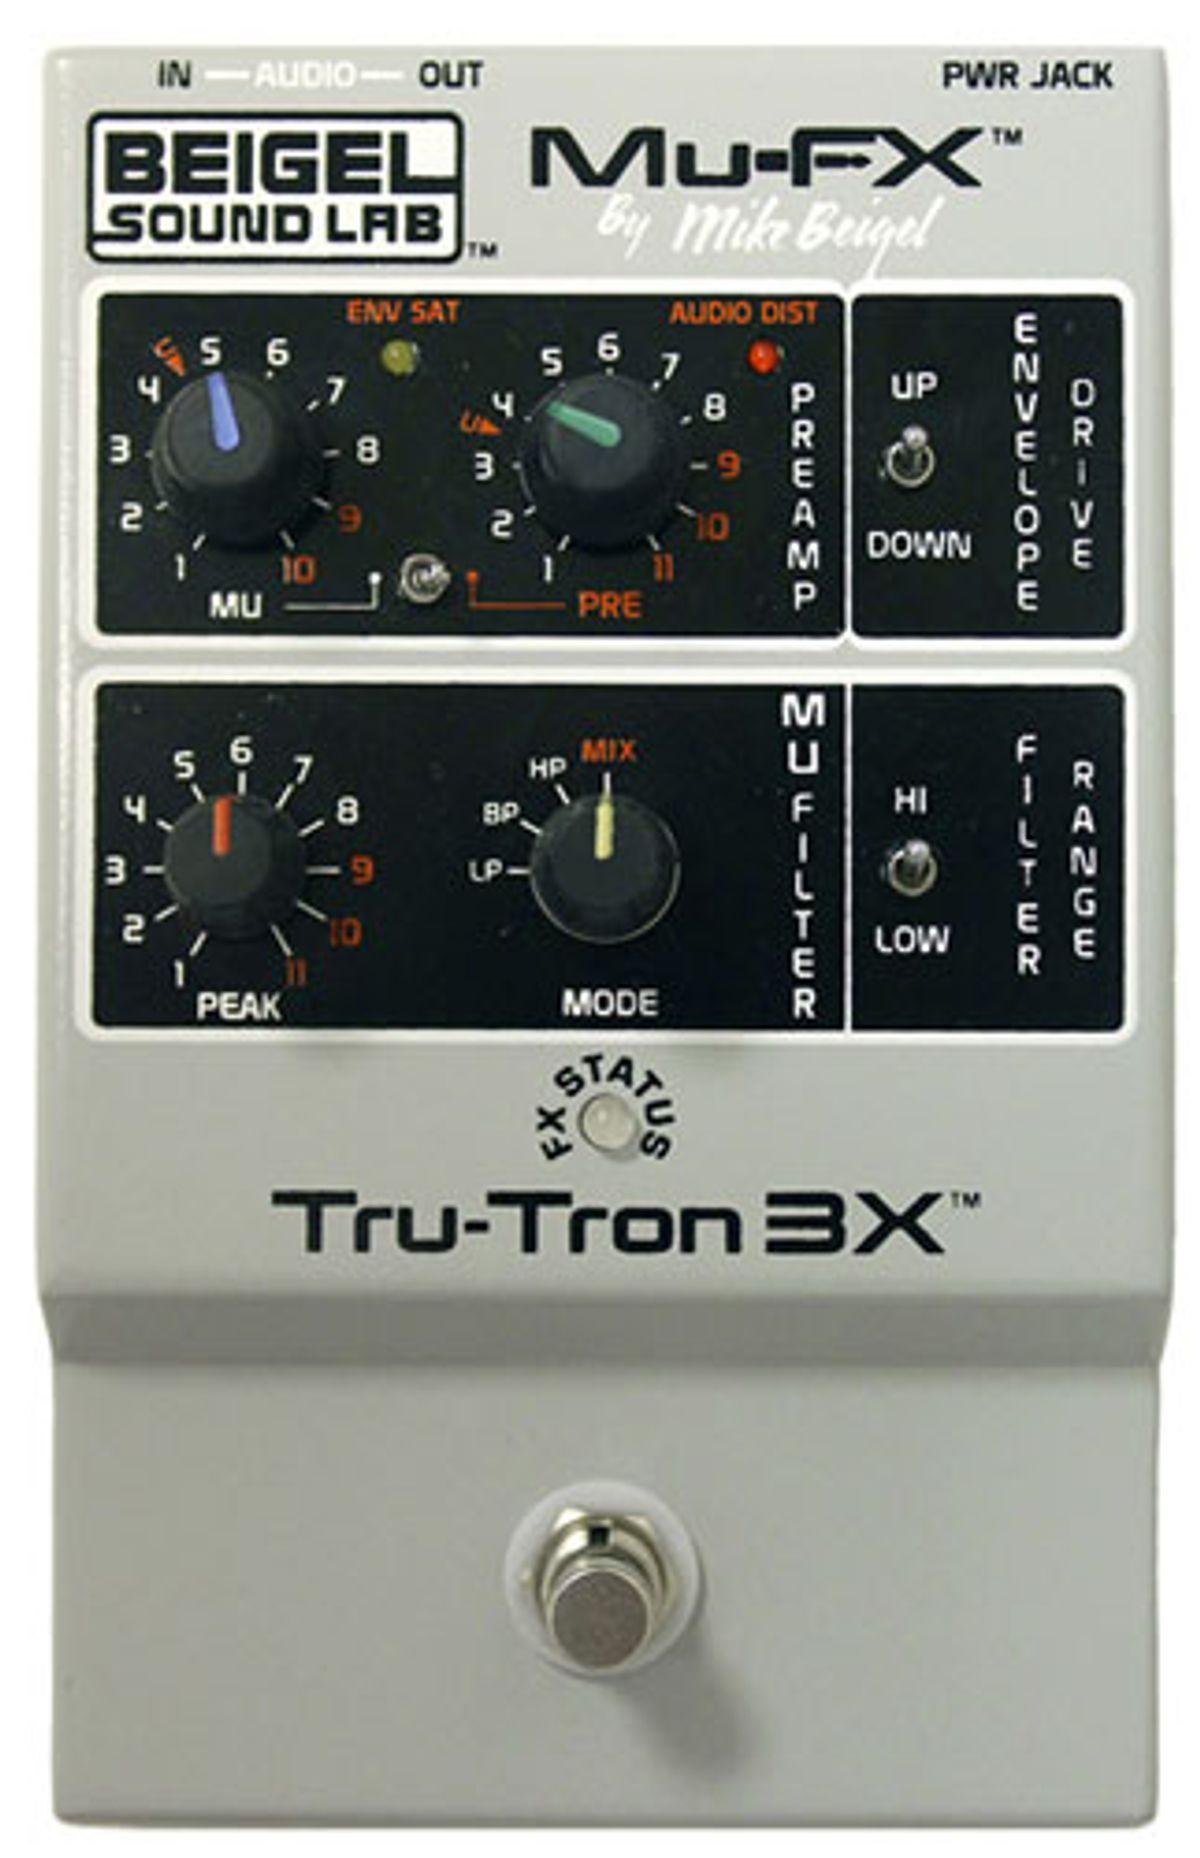 Beigel Sound Labs Unveils the Tru-Tron 3X